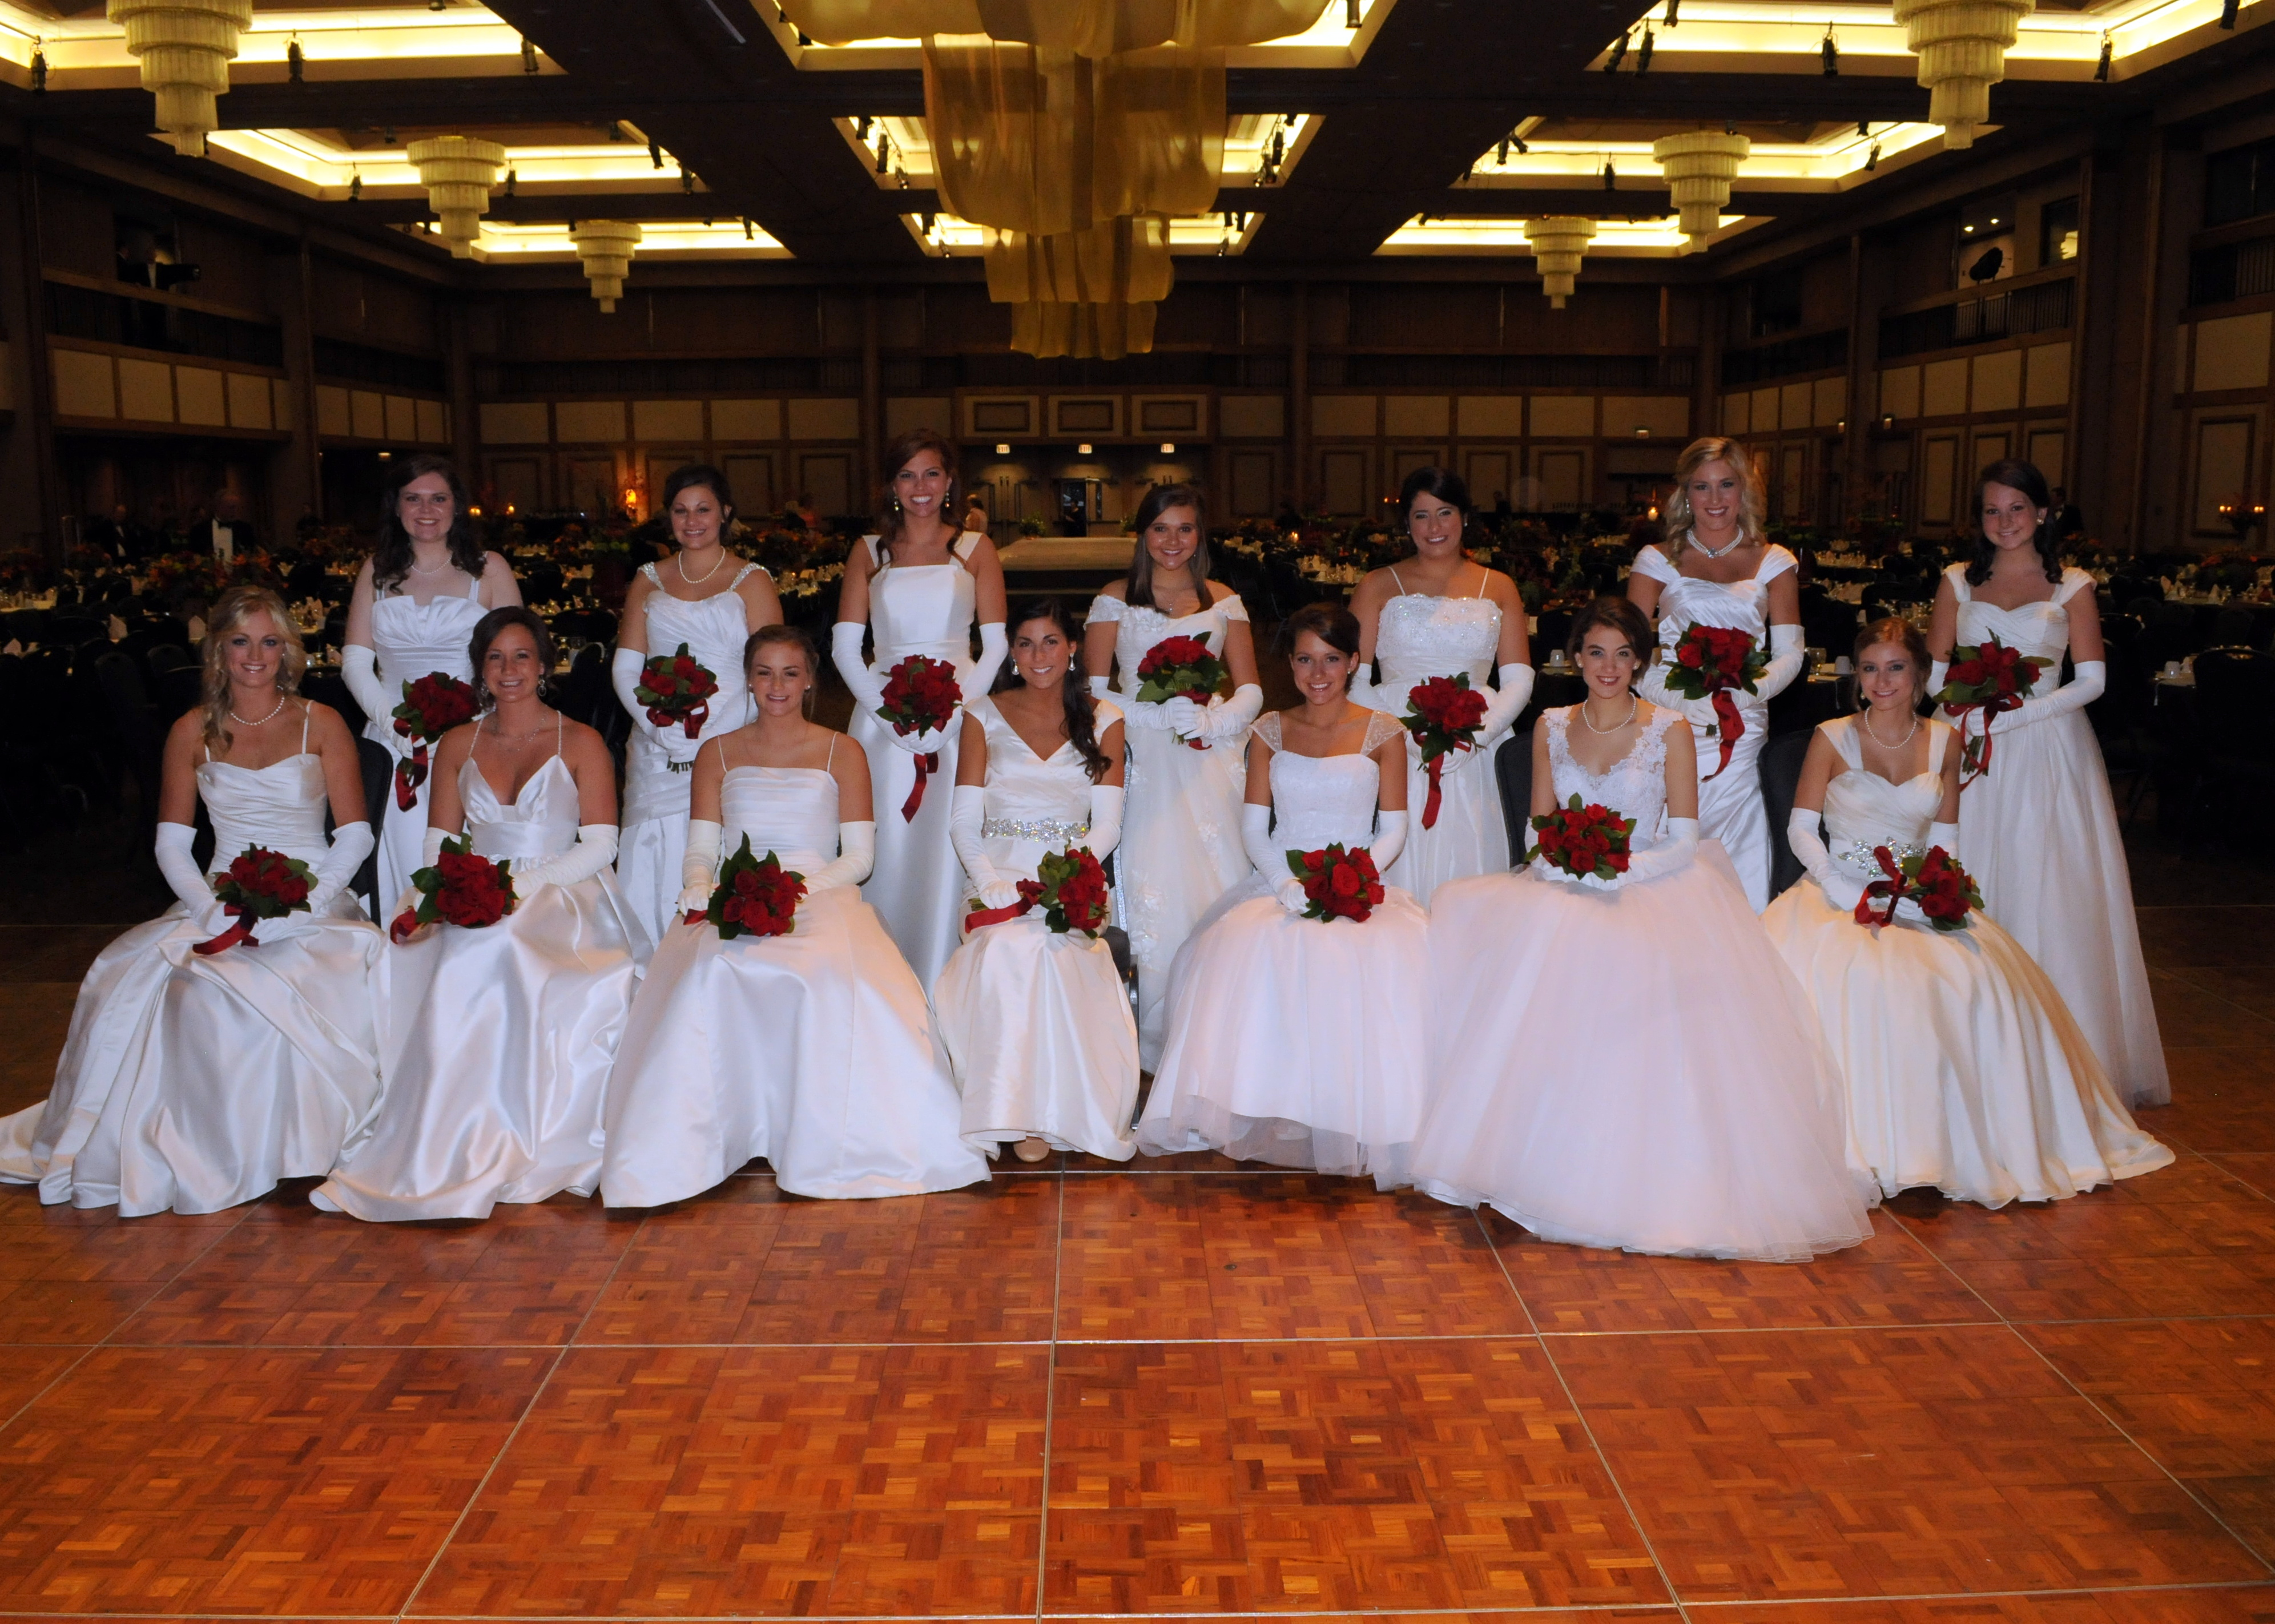 2013 Huntsville Symphony Orchestra Debutantes Group 2